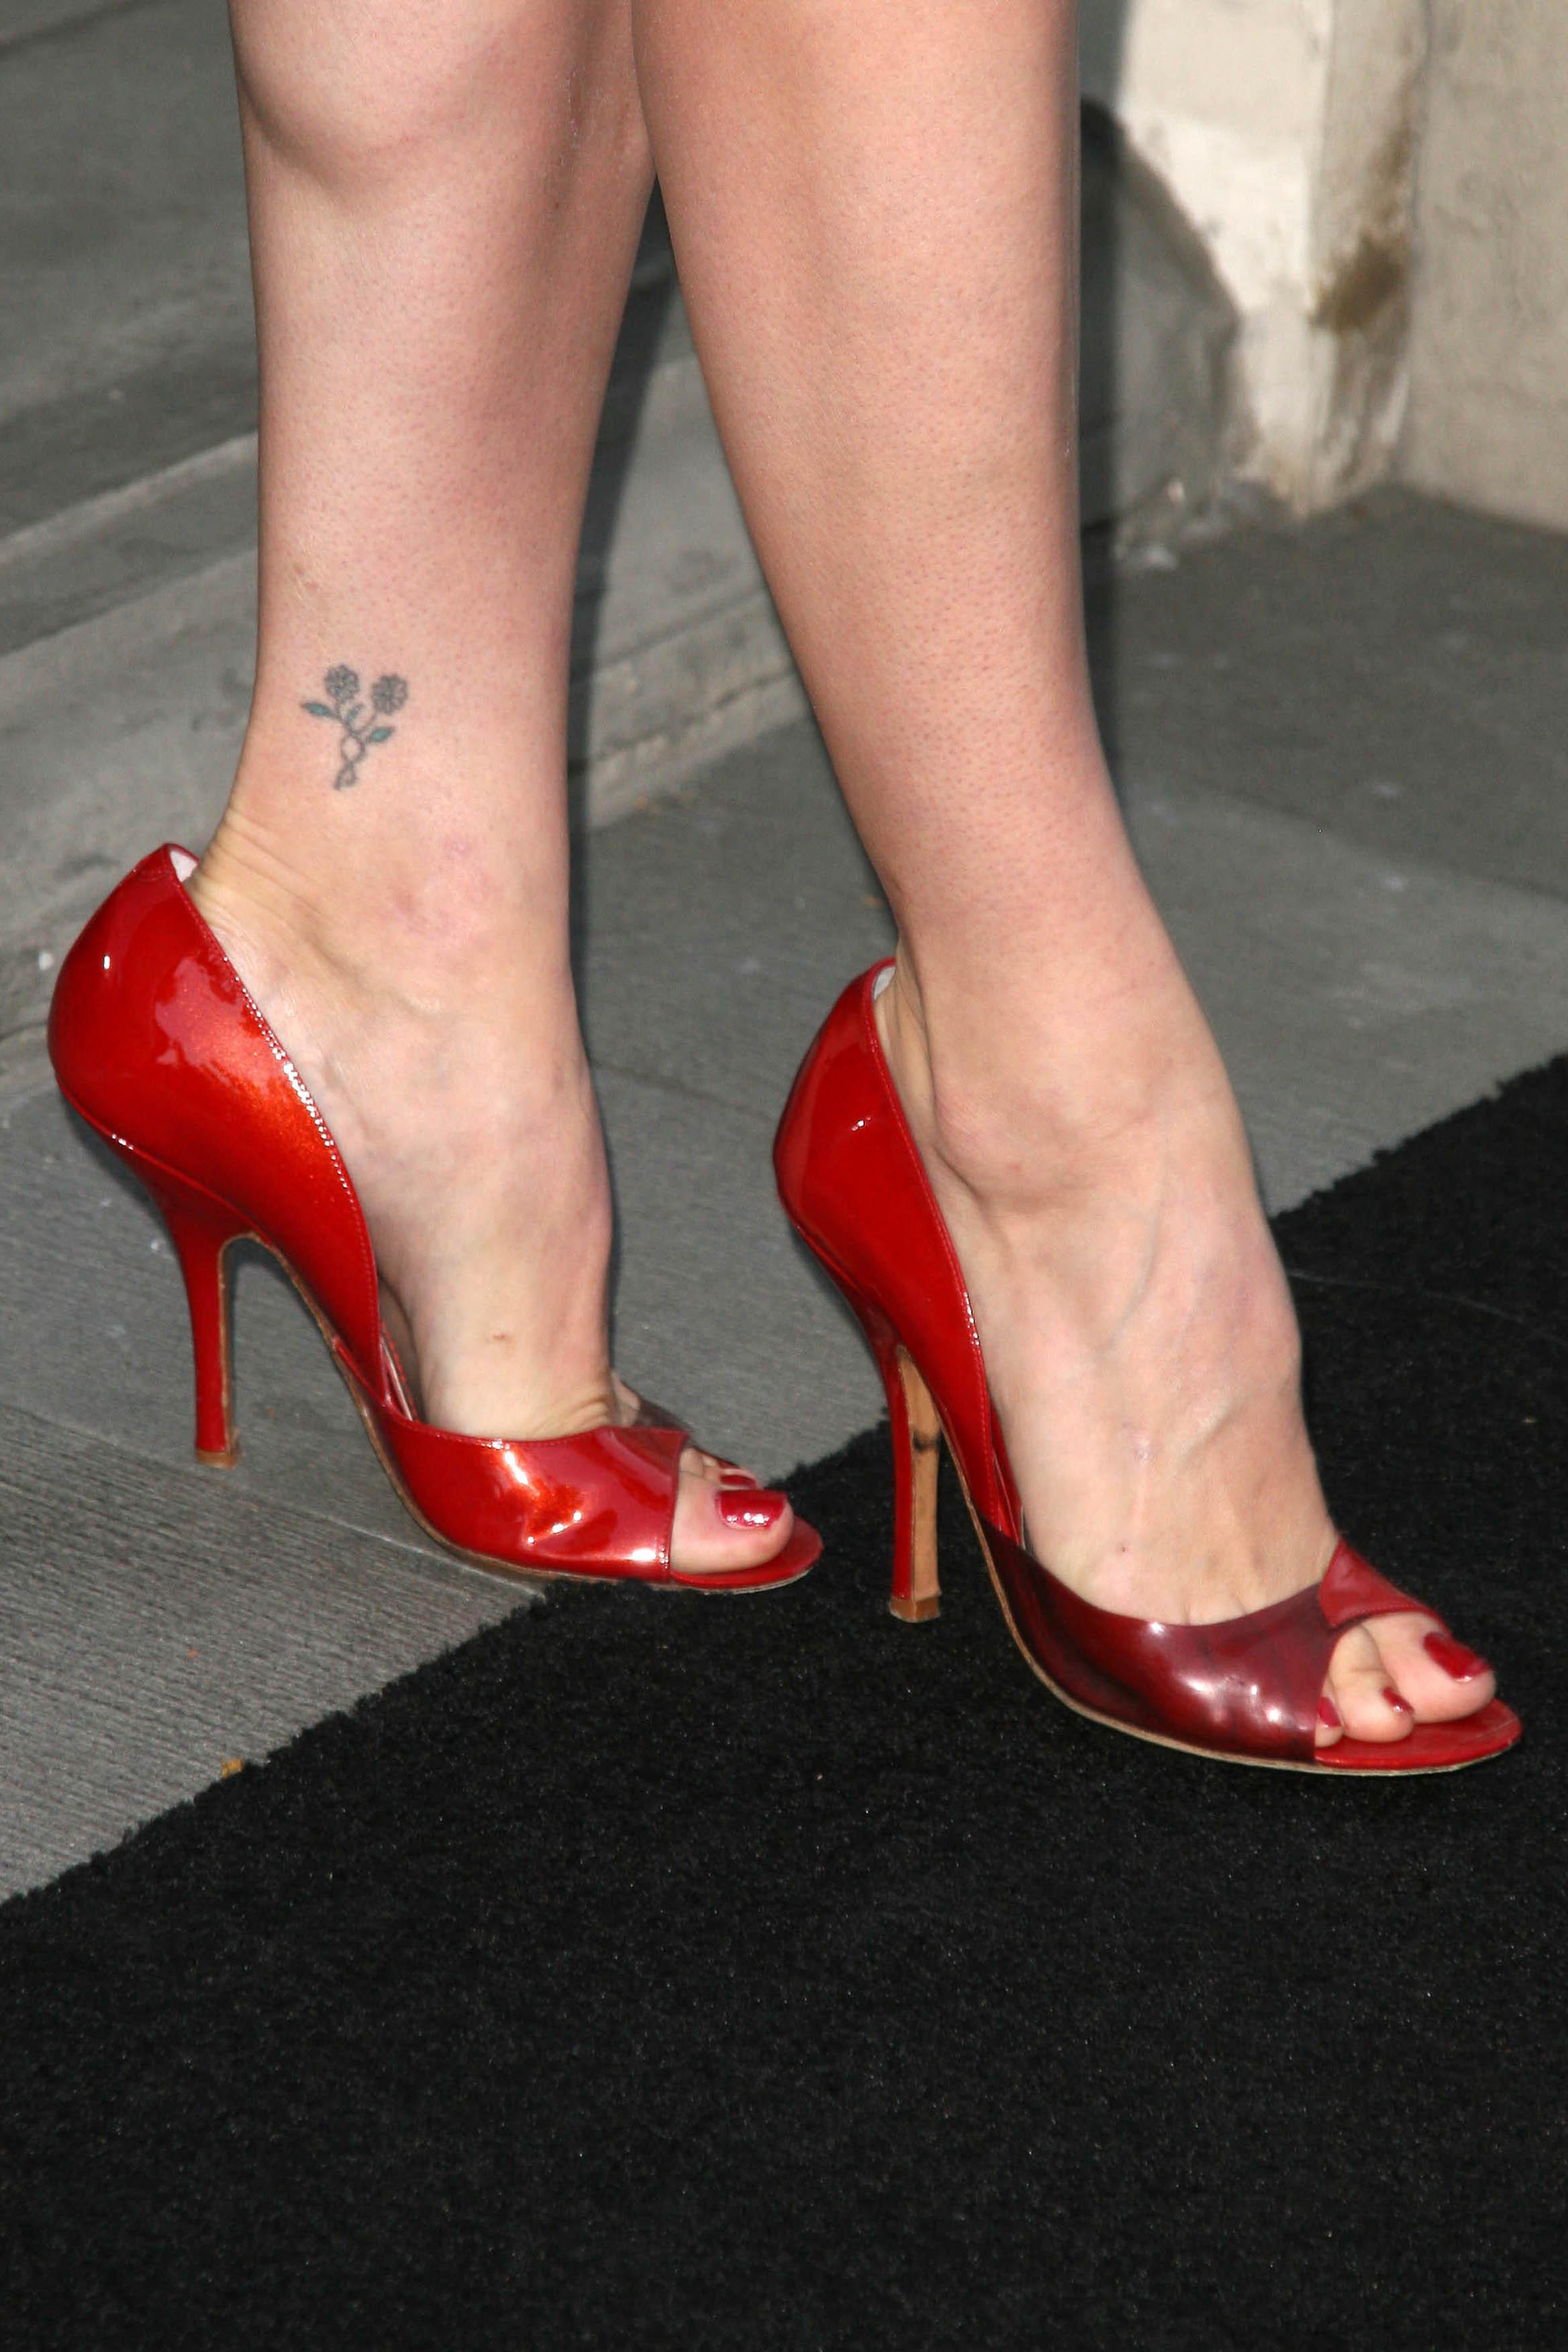 heather tom's feet << wikifeet